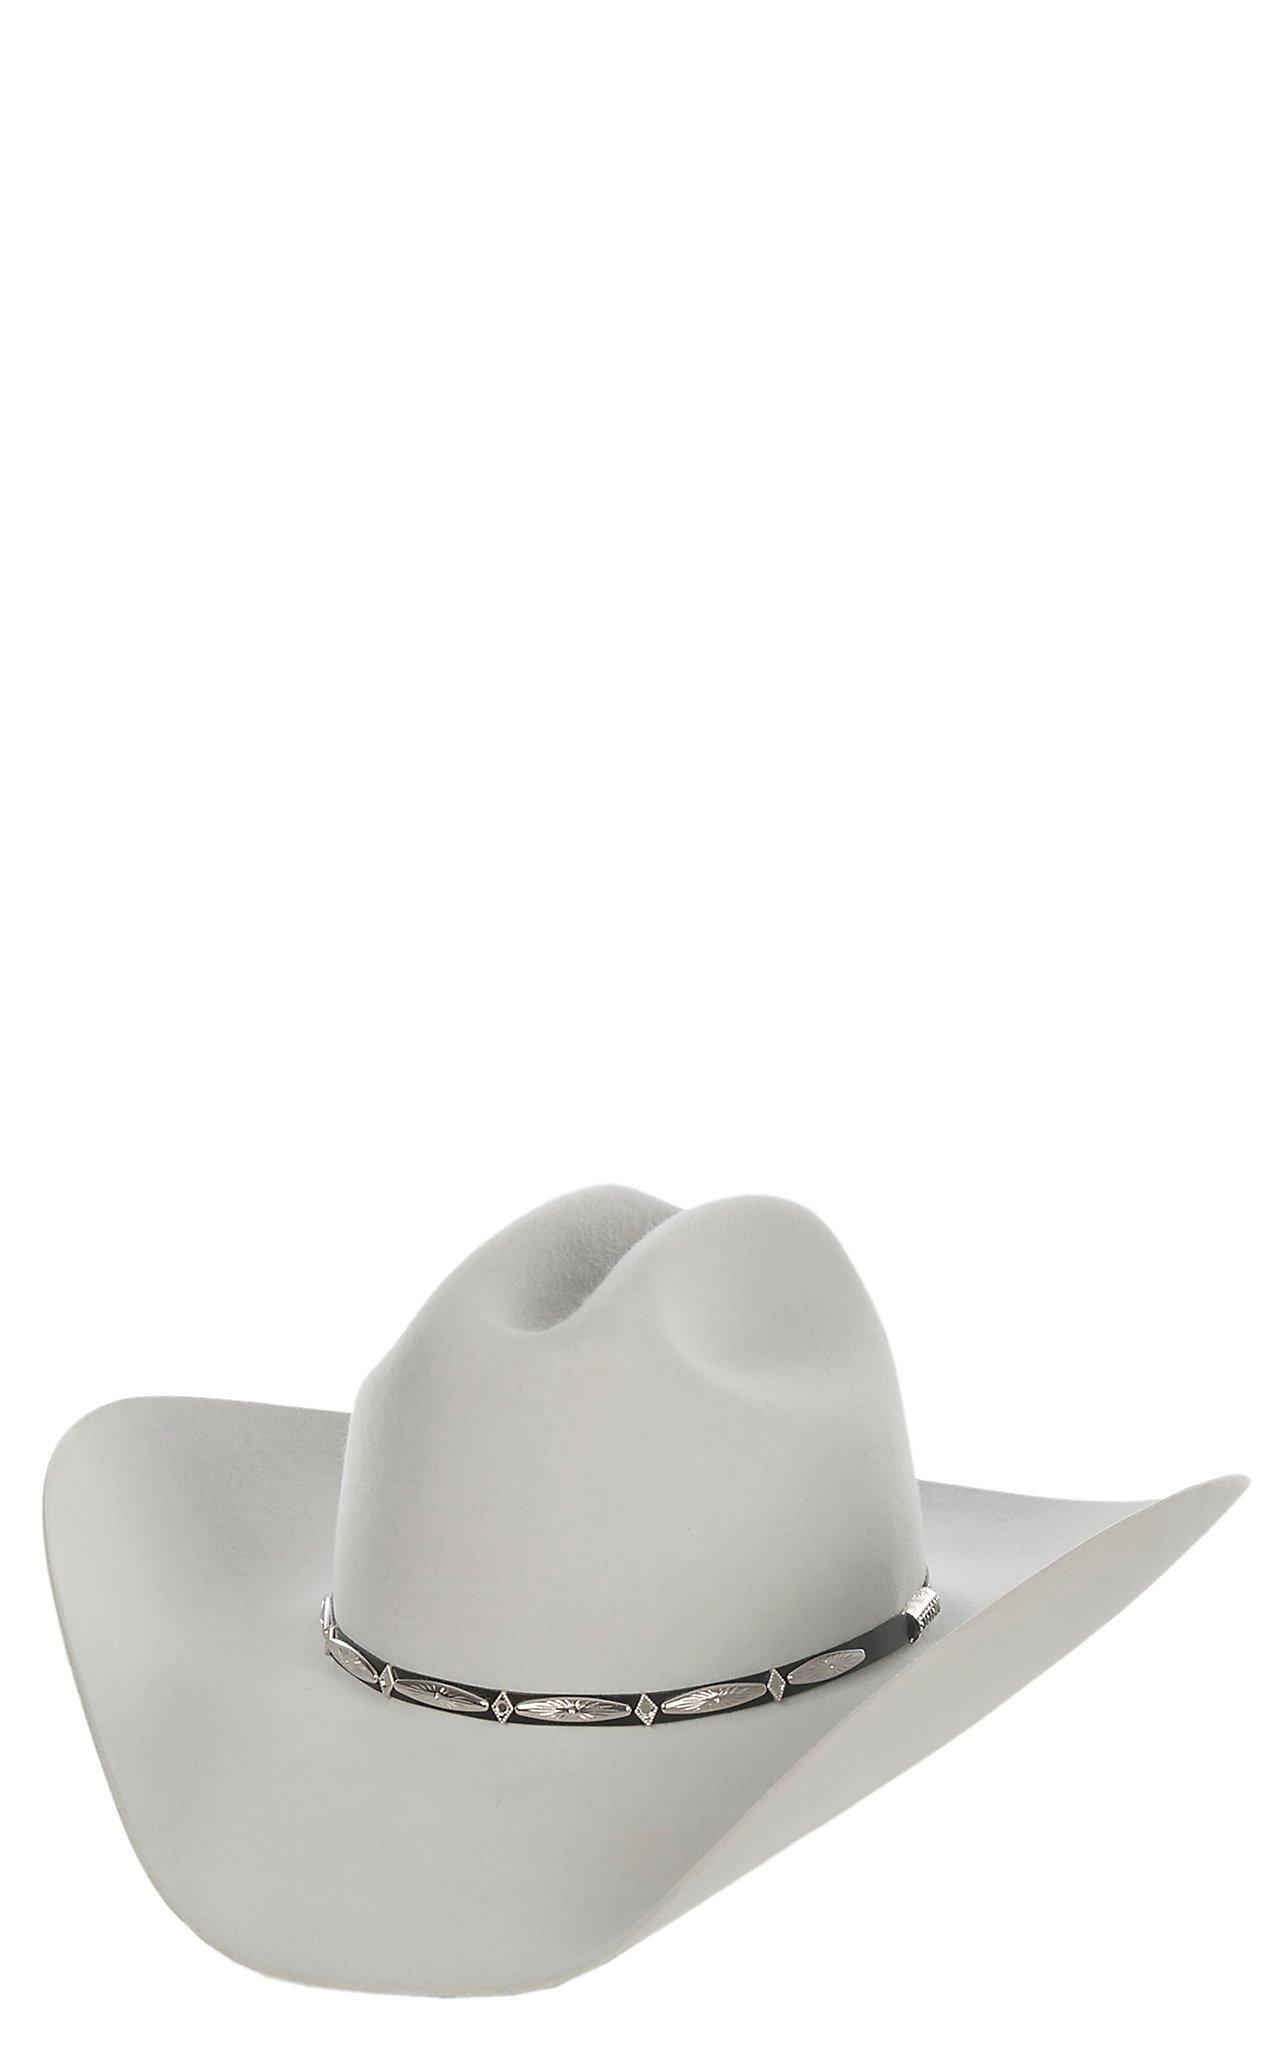 Stetson 6X Del Norte Silver Grey Felt Cowboy Hat  693a3ed2e90